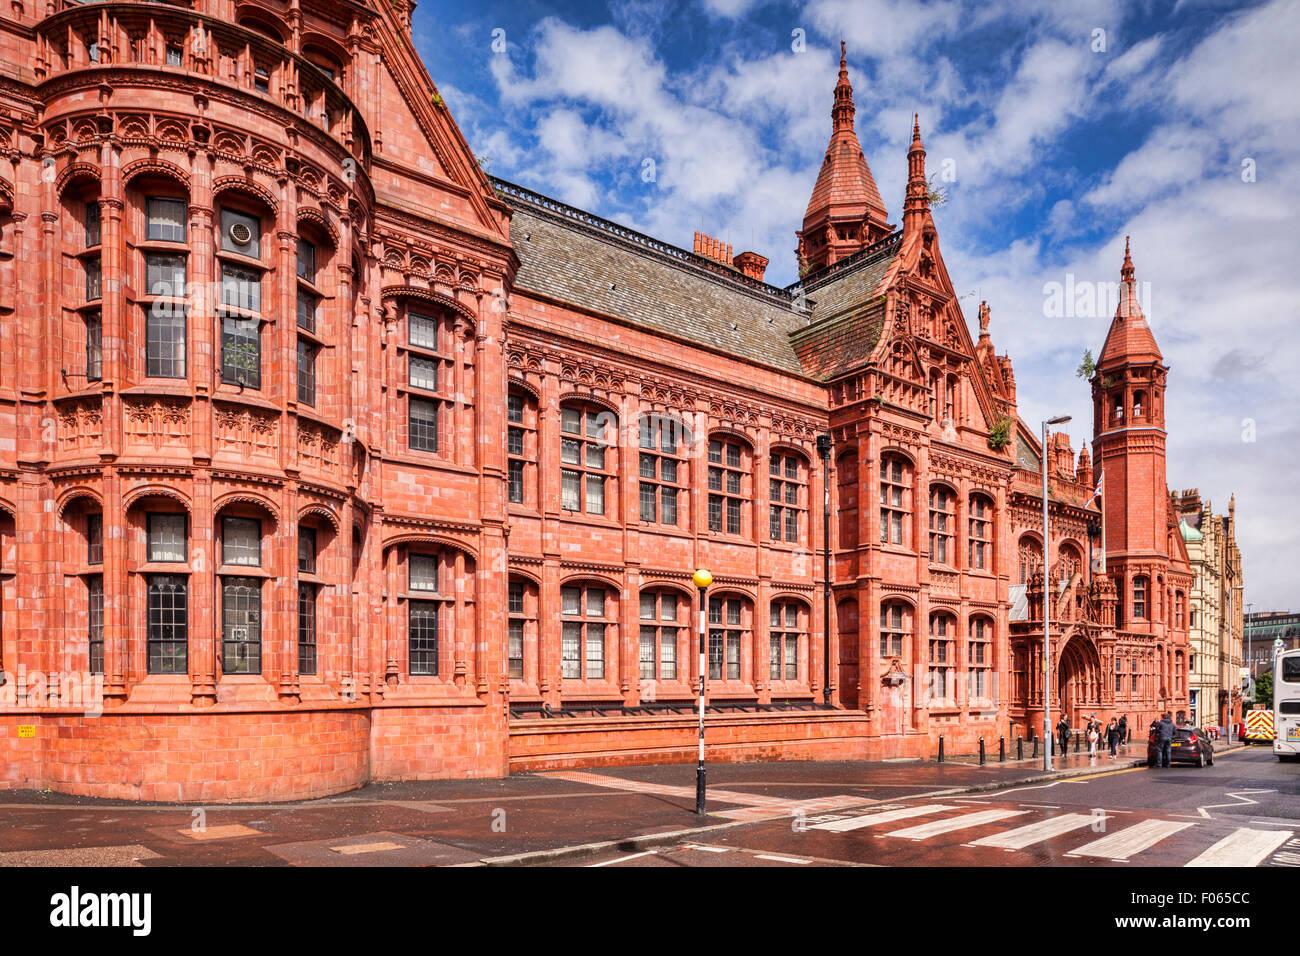 Birmingham Victoria Law Courts, Corporation Street, Birmingham, West Midlands, England - Stock Image